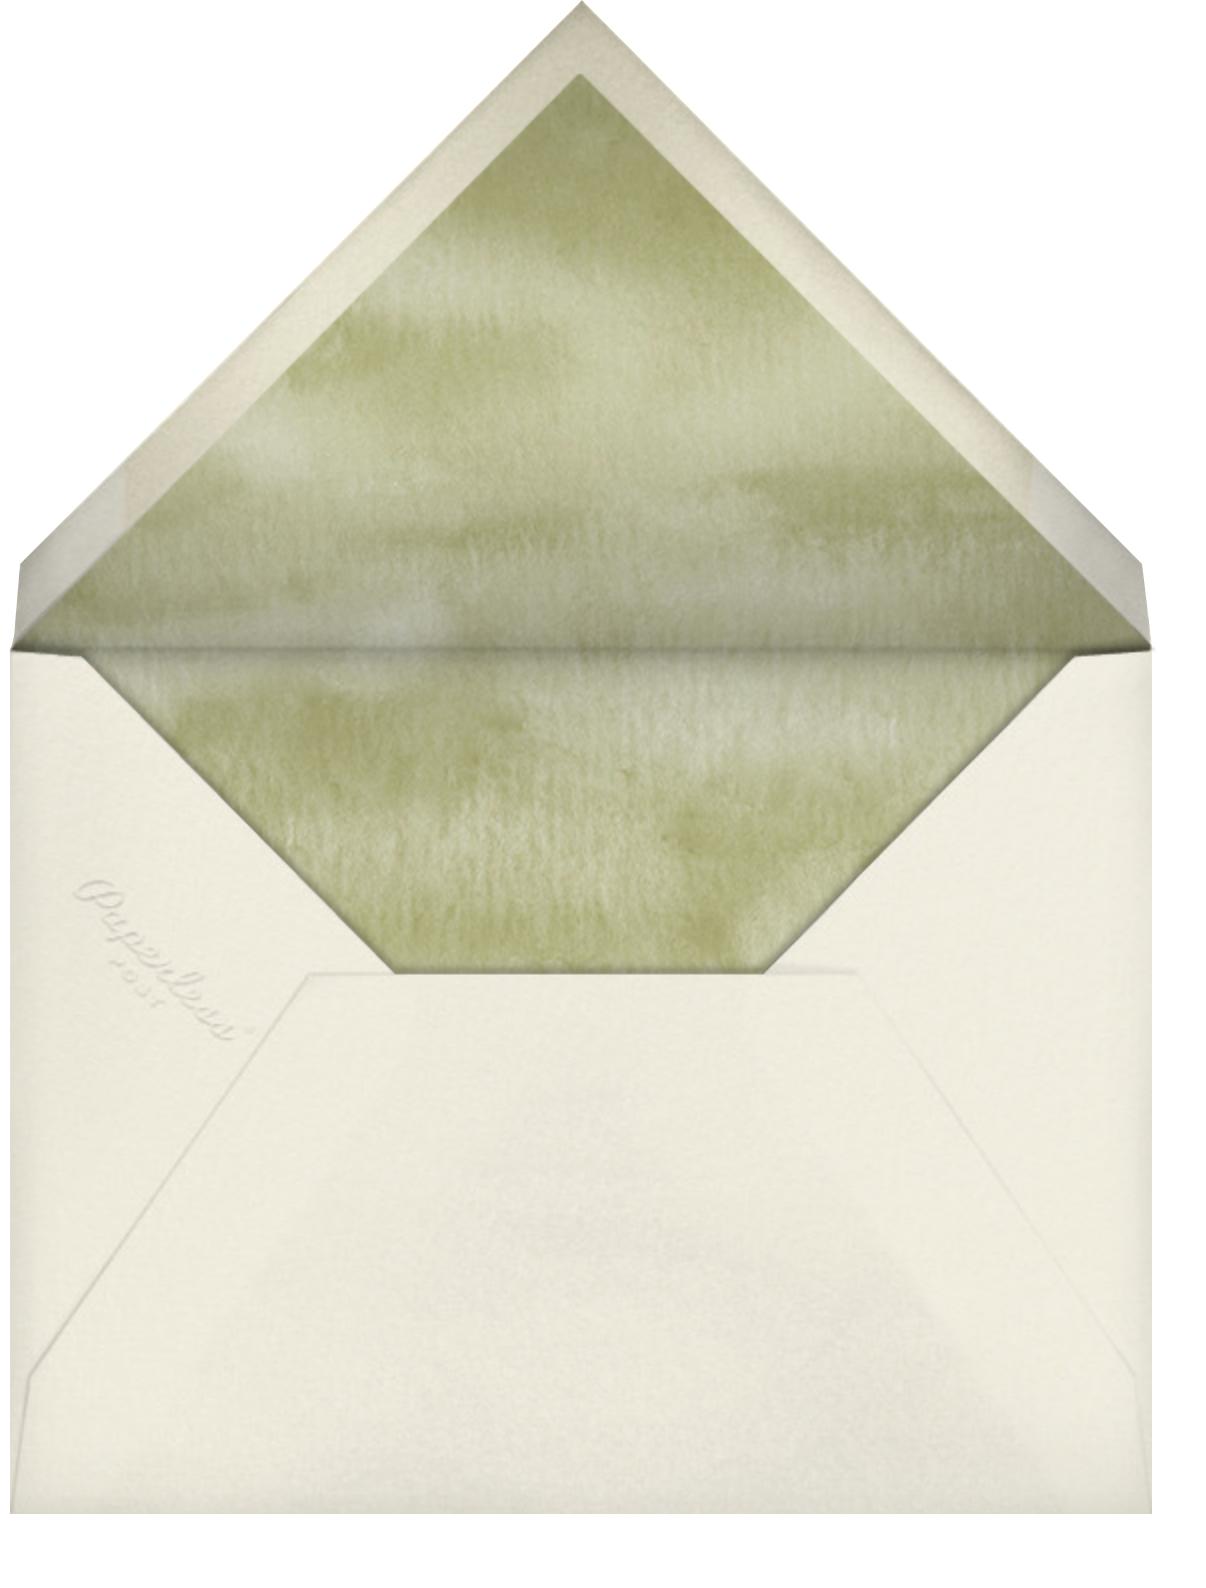 Onesie Delivery - Photo - Felix Doolittle - Birth - envelope back